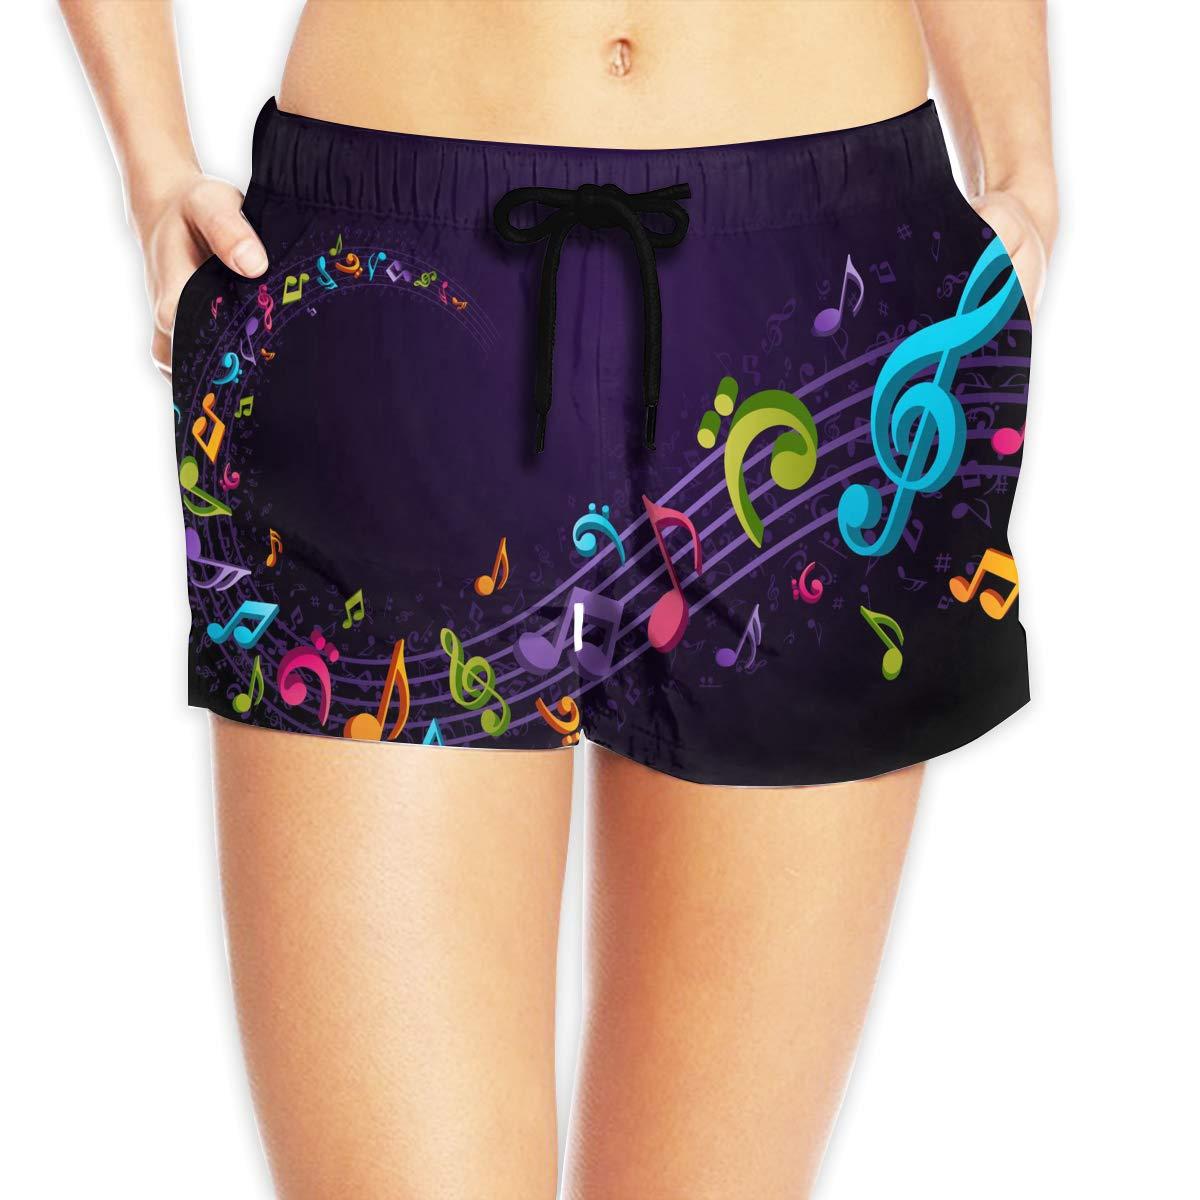 Eakllci Colorful Music Notes Womens Summer Beach Shorts Swim Boardshorts